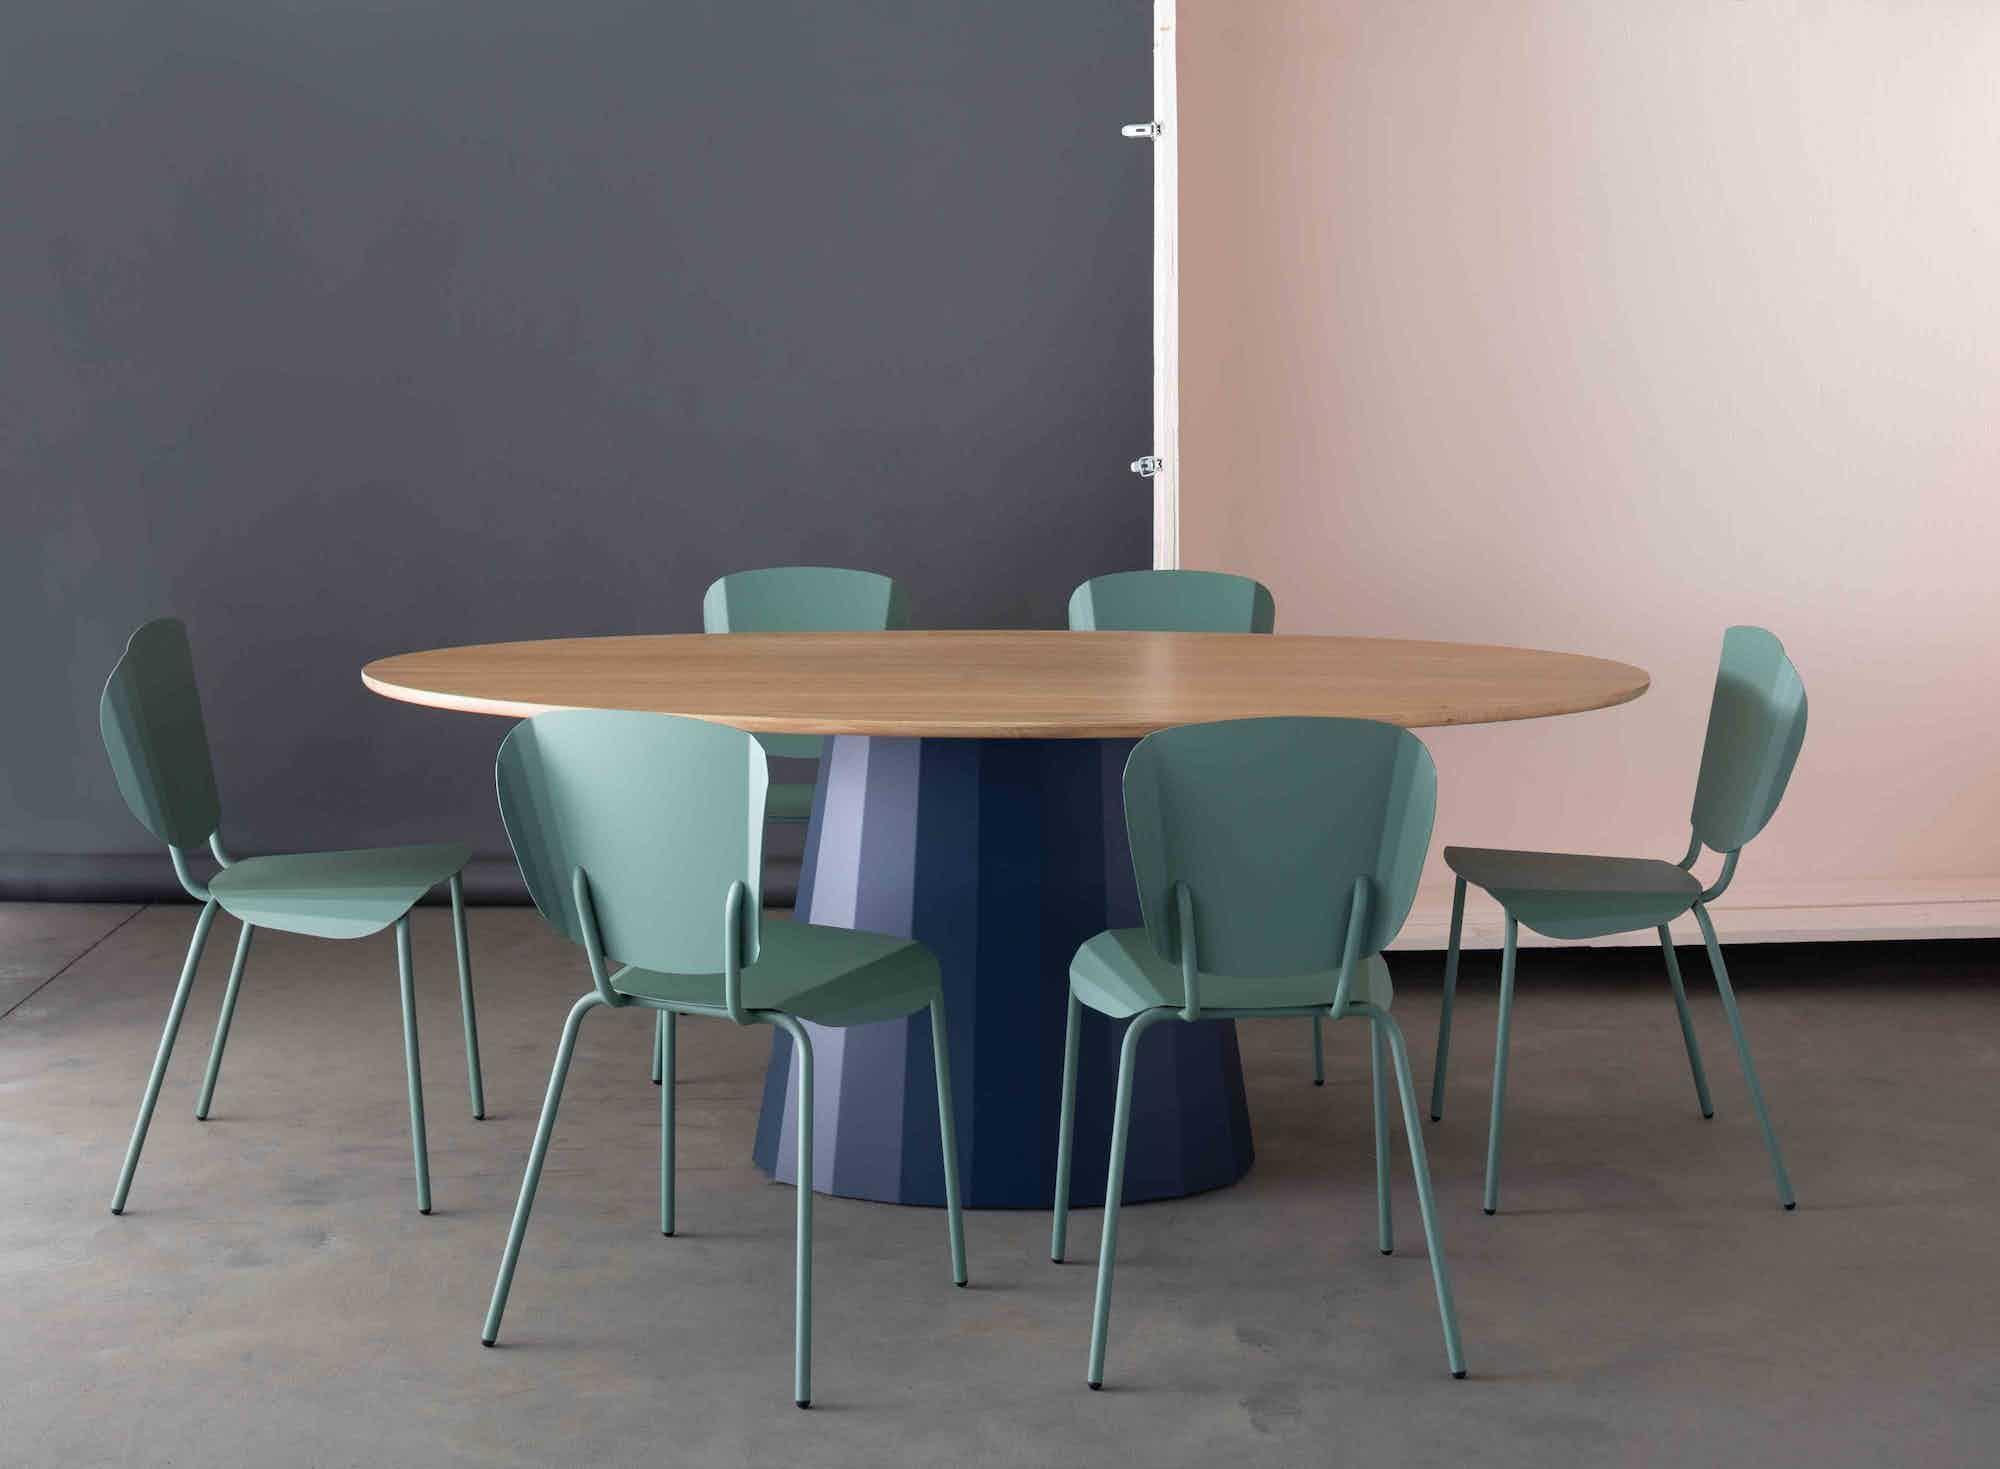 Matiere grise constance guisset ankara table repas ovale 100x200xh75 metal bois table salle a manger chaise design batchair